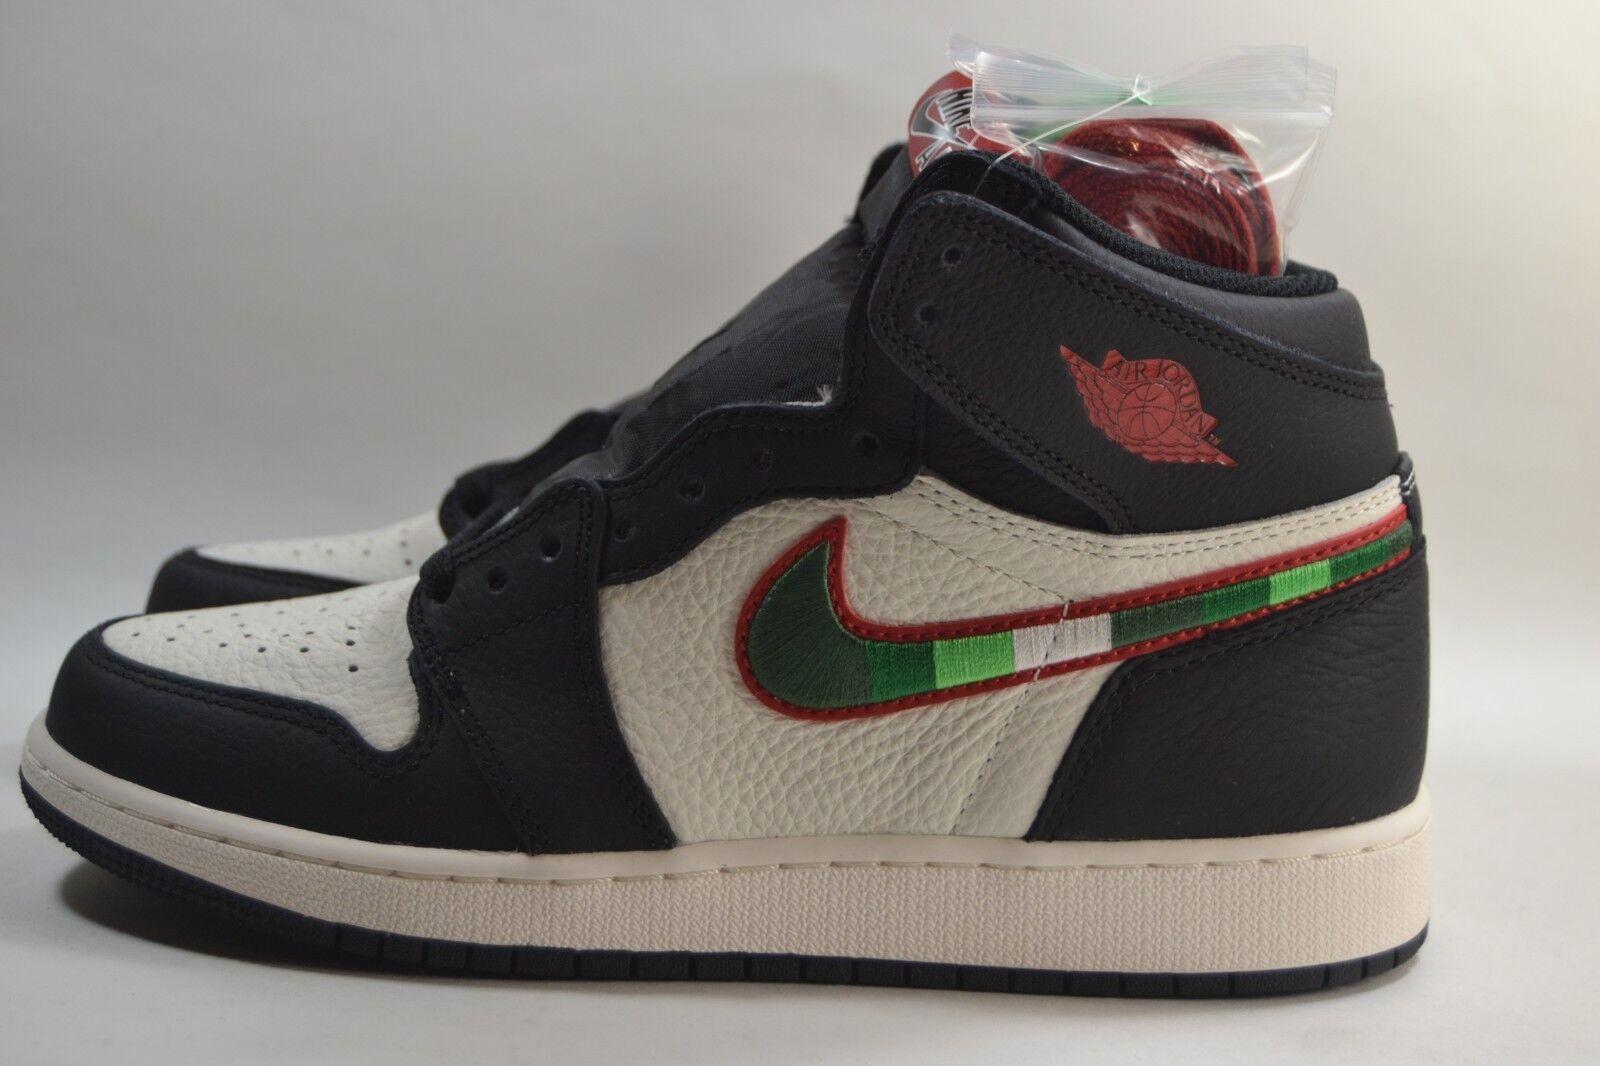 New Nike Air Jordan 1 Retro High OG Sports Illustrated A Star is Born 555088-015